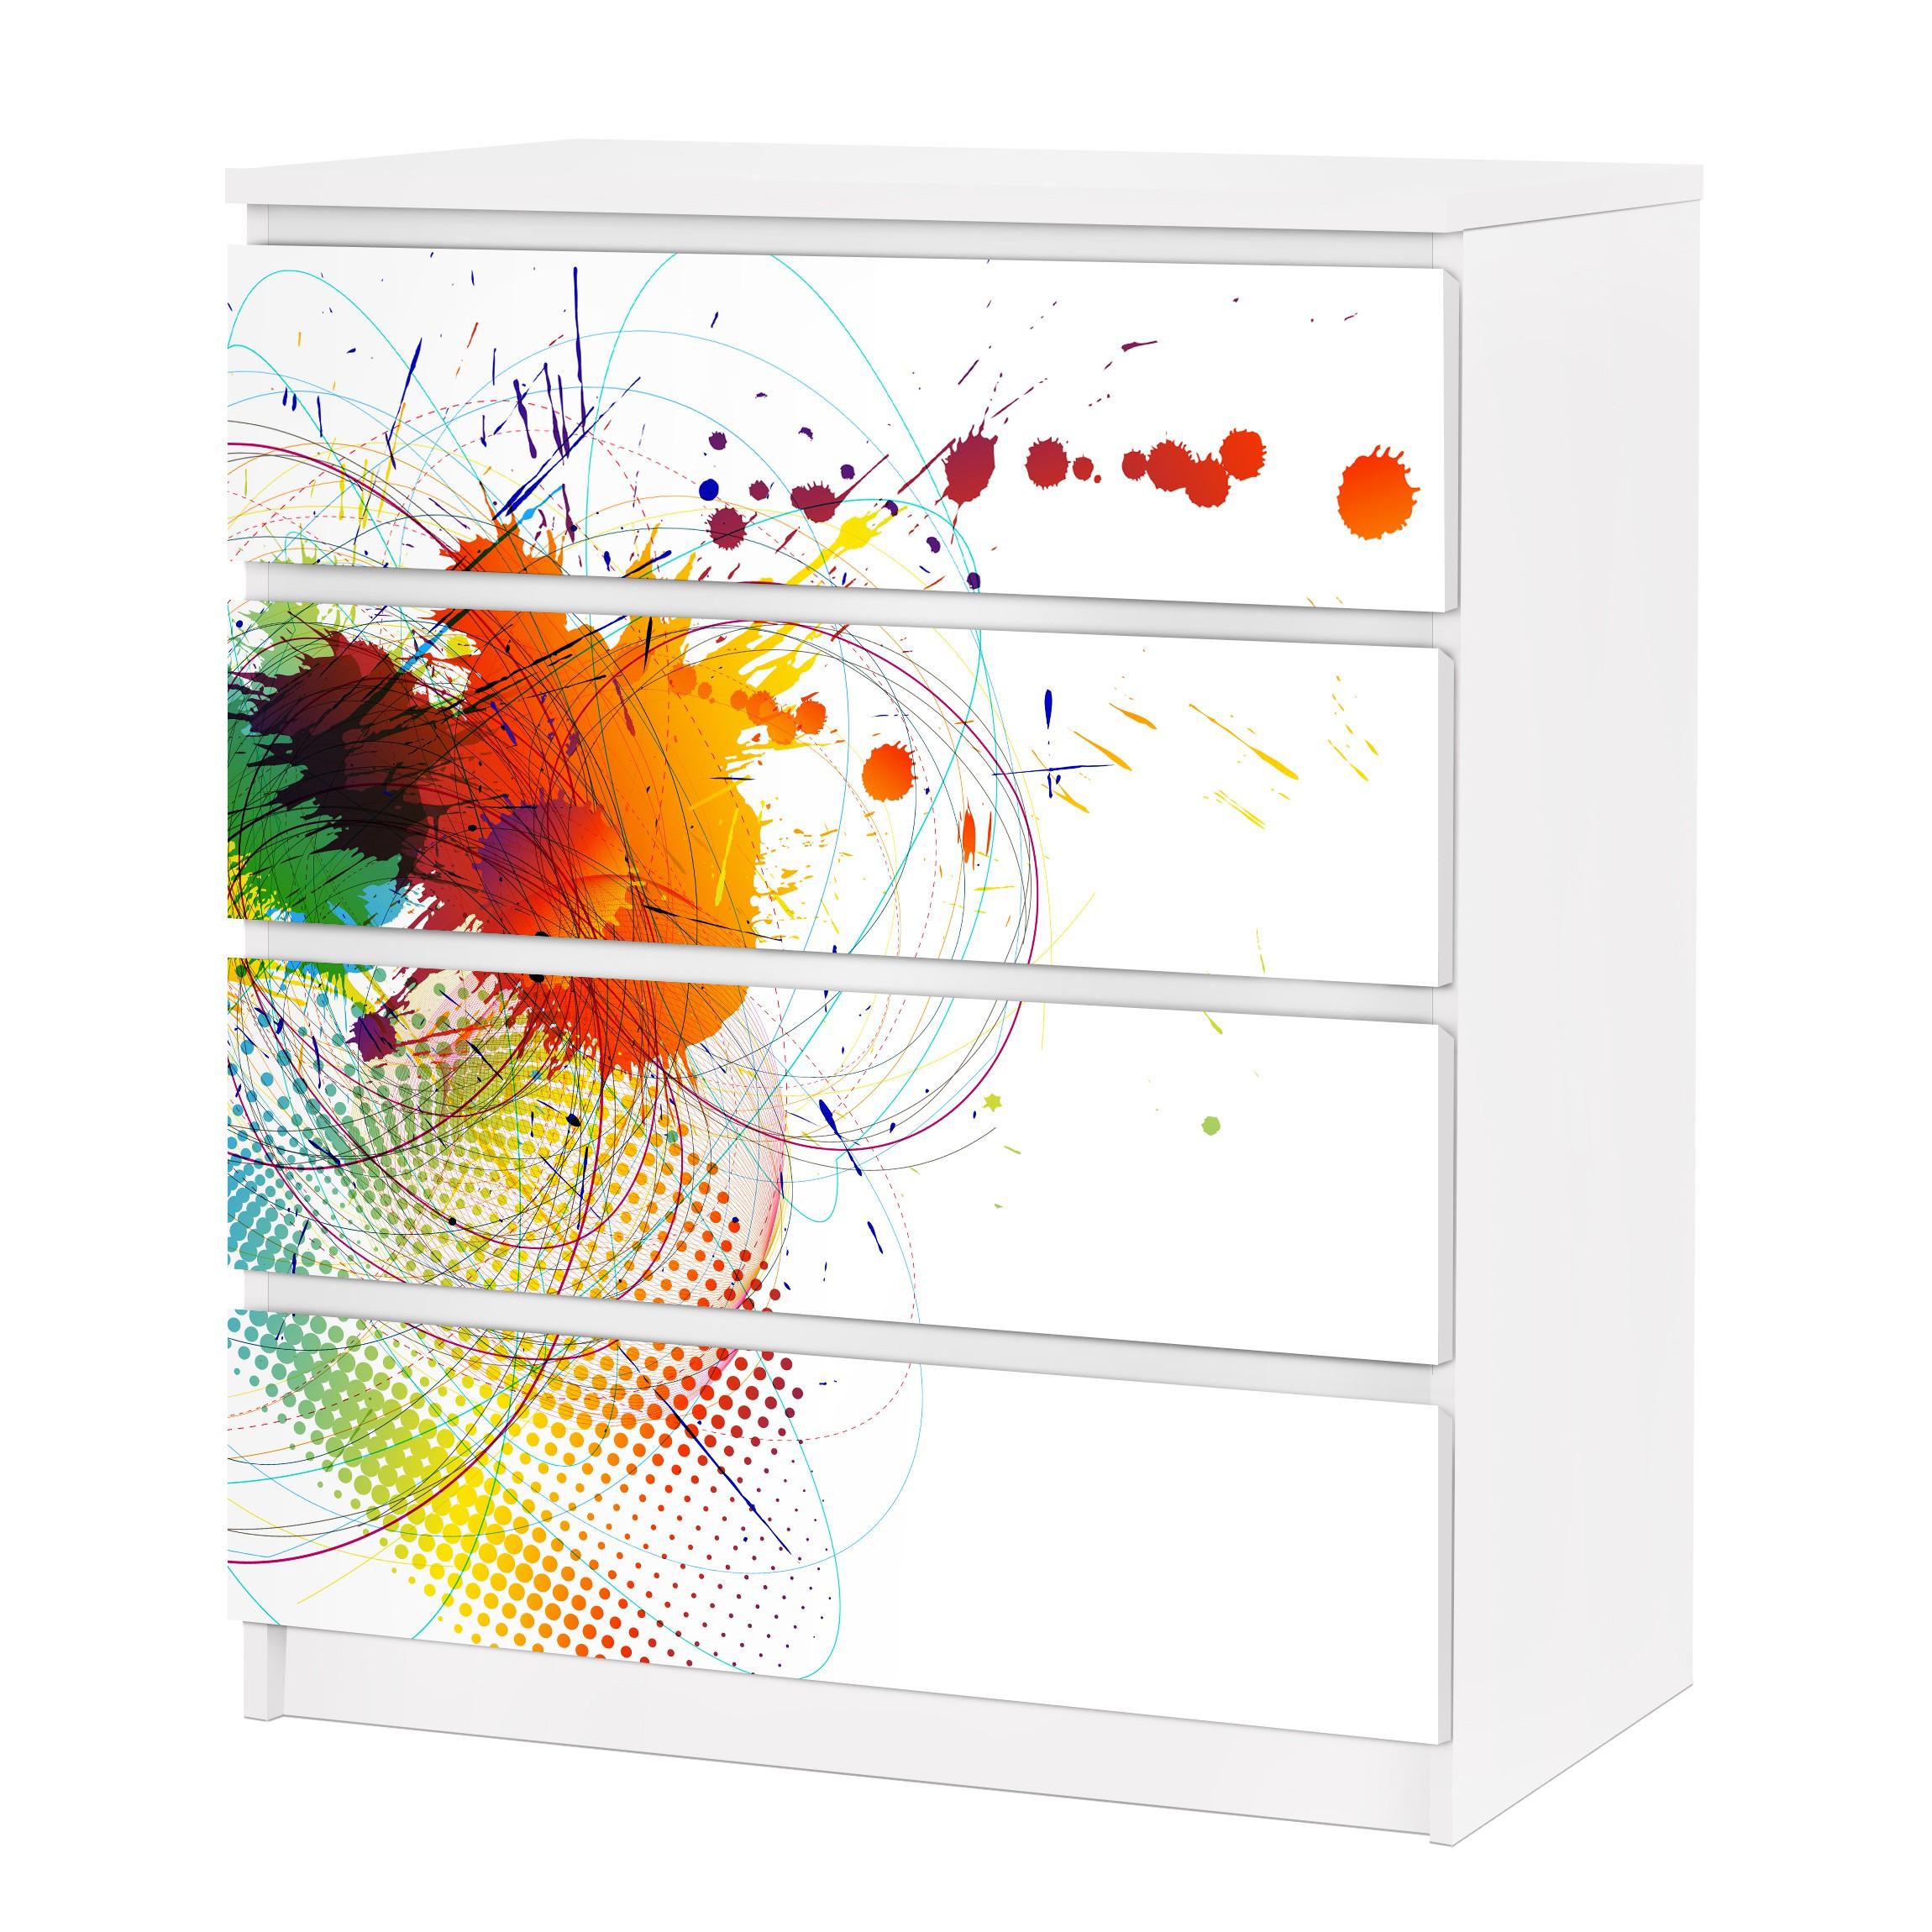 Carta adesiva per mobili ikea malm cassettiera 4xcassetti rainbow background - Carta adesiva per mobili ikea ...